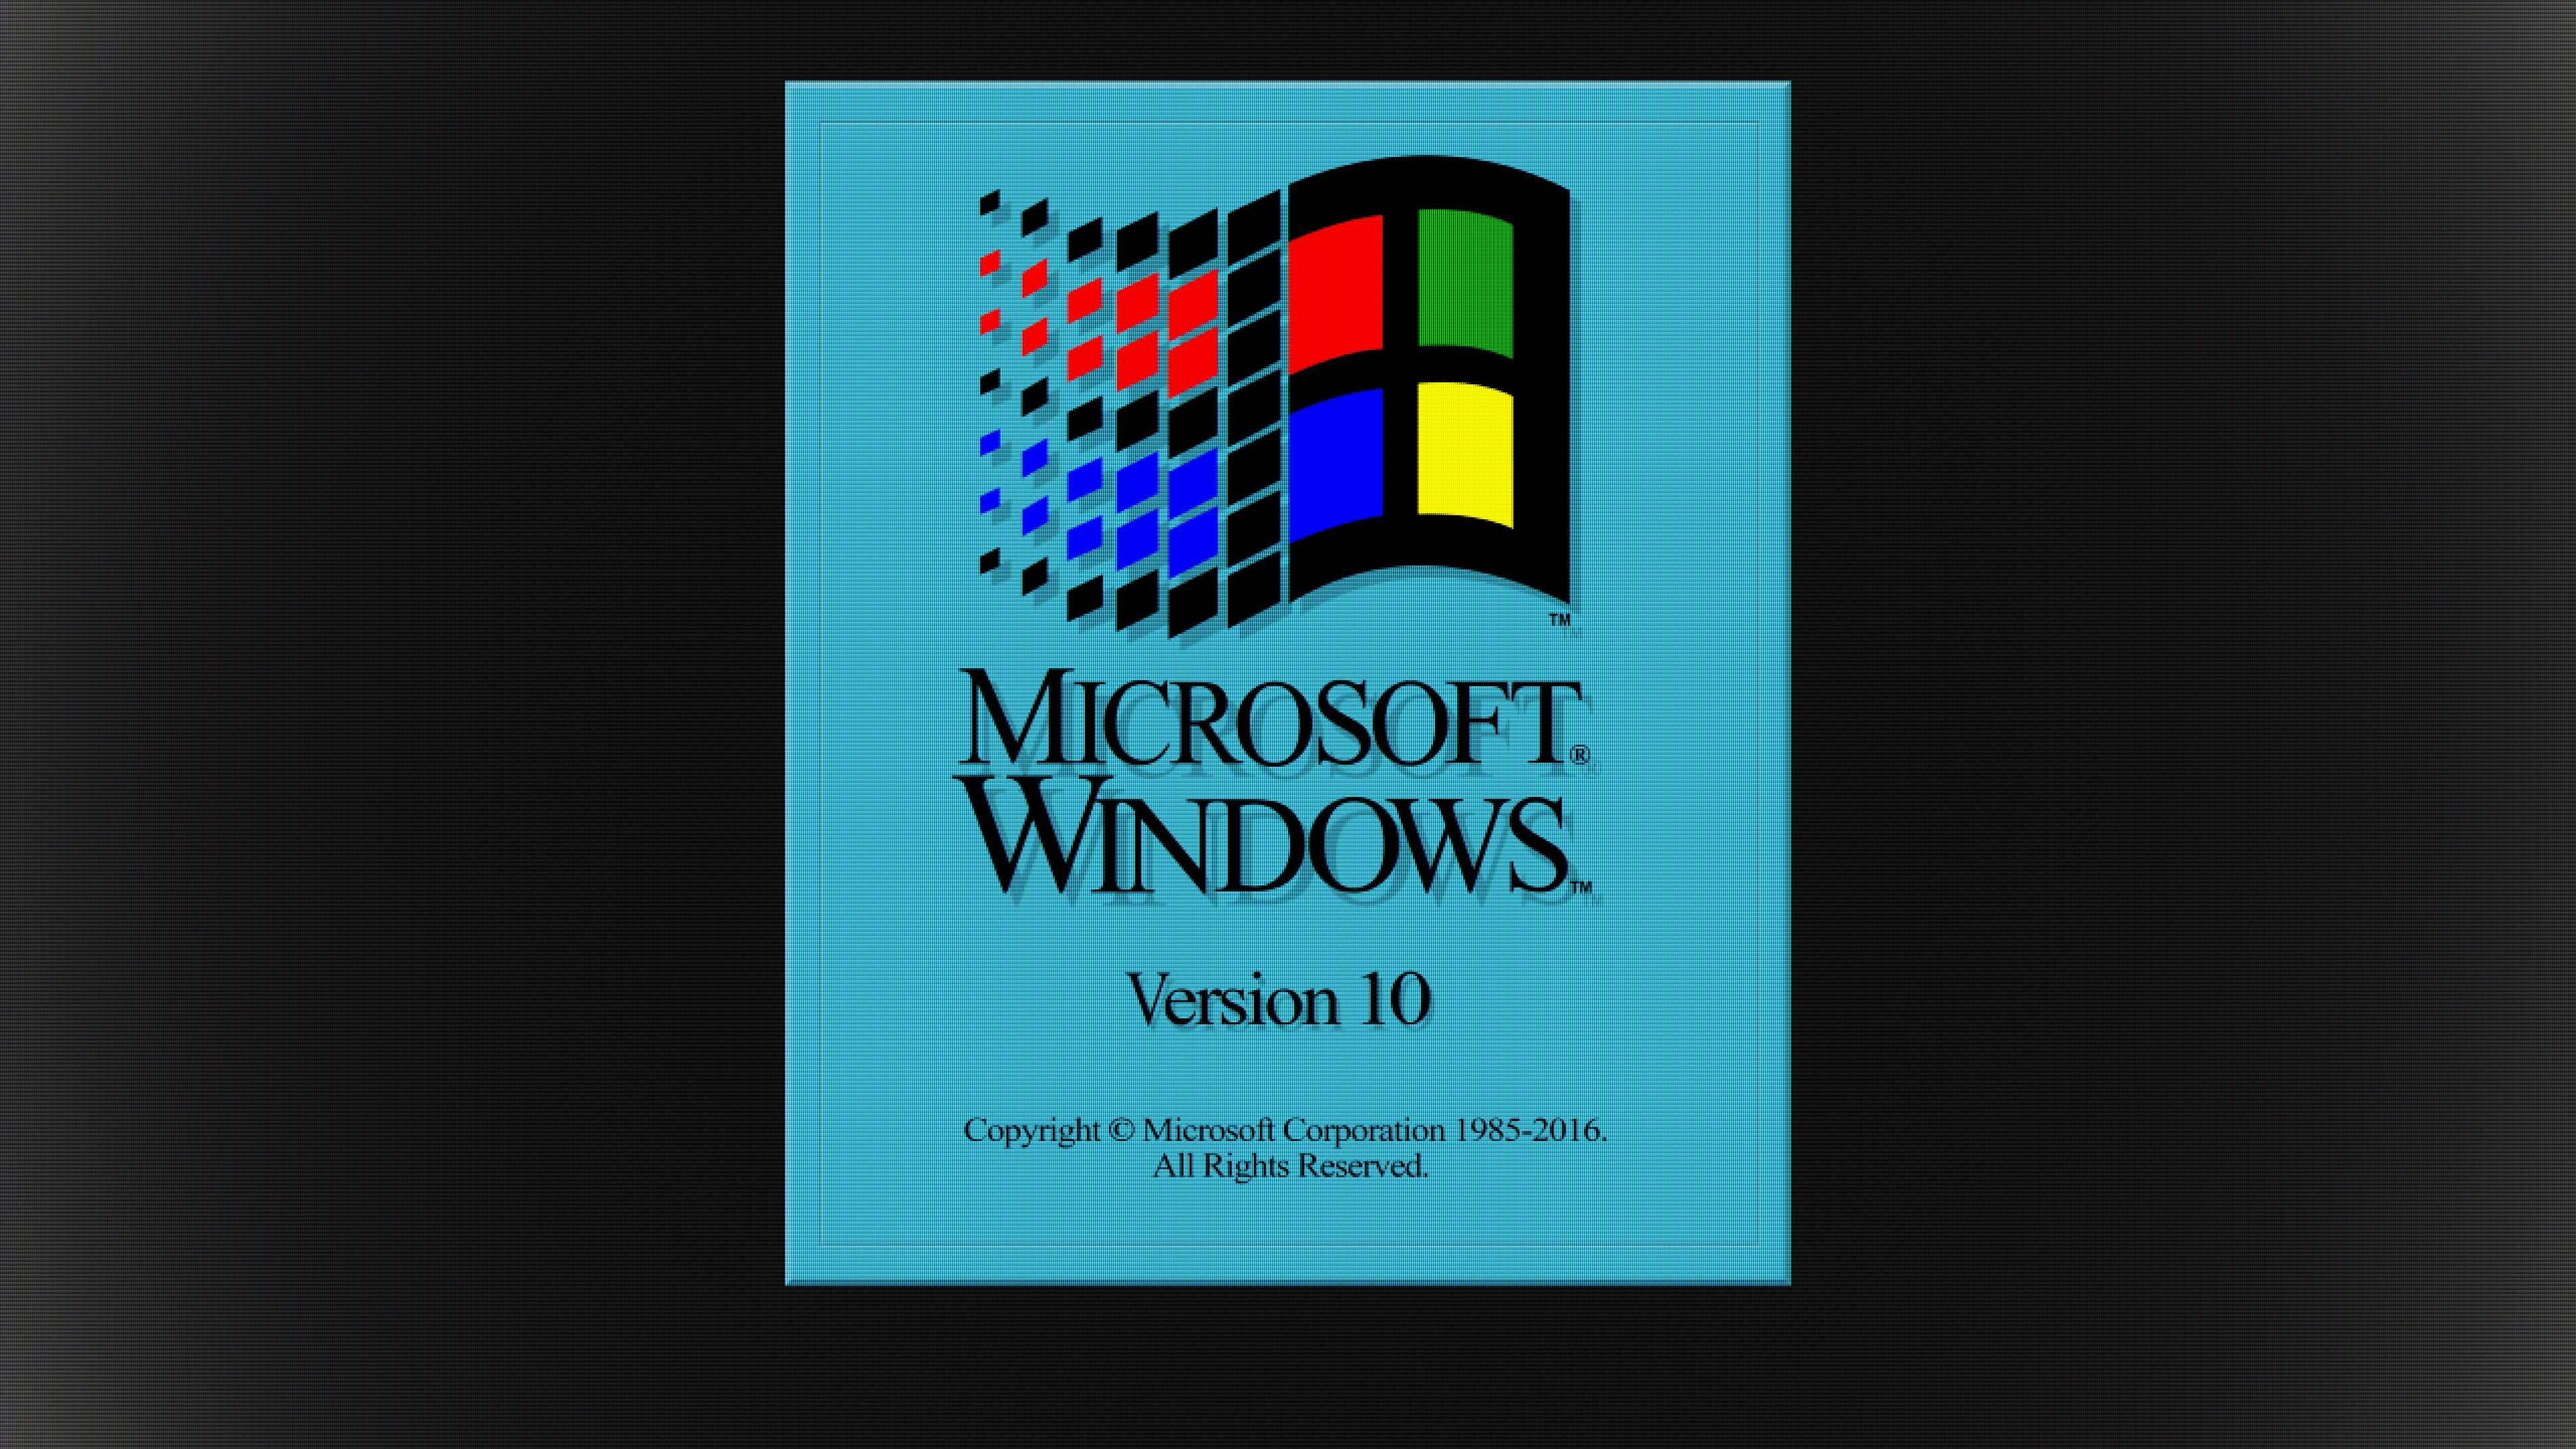 Windows 10 Retro 3.1 UHD 4K Wallpaper